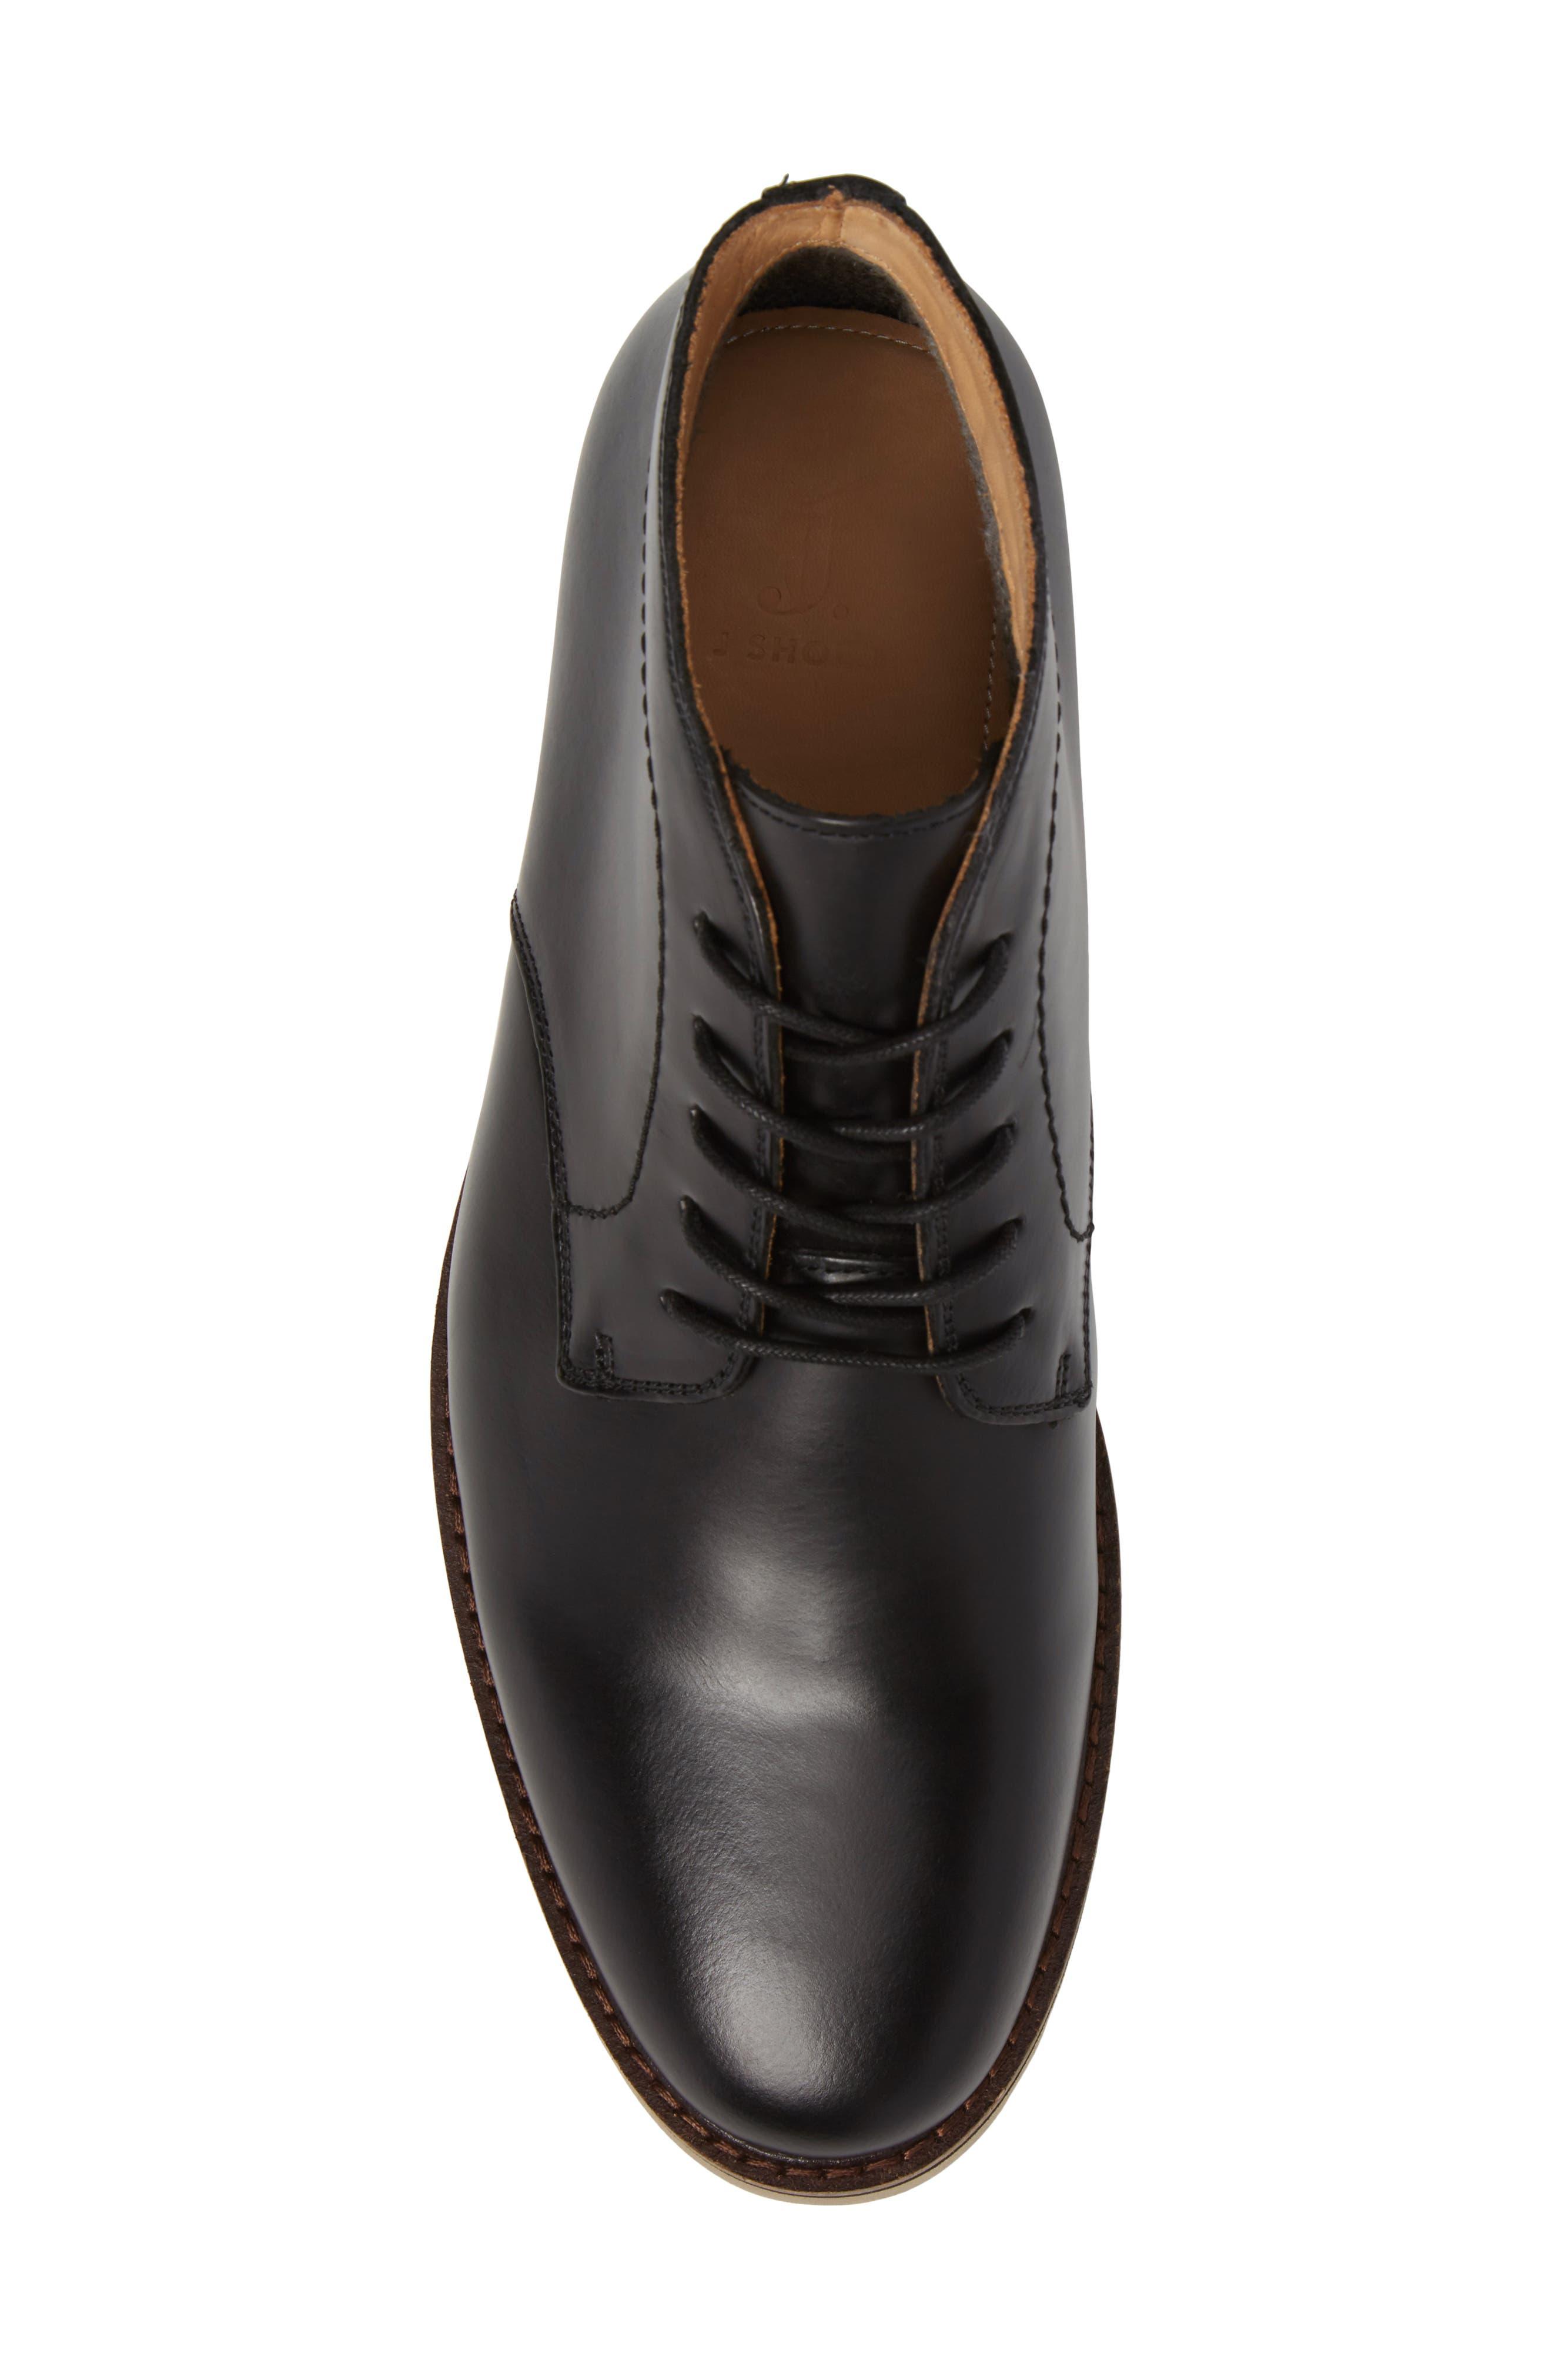 'Farley' Chukka Boot,                             Alternate thumbnail 5, color,                             Black/ Black Leather